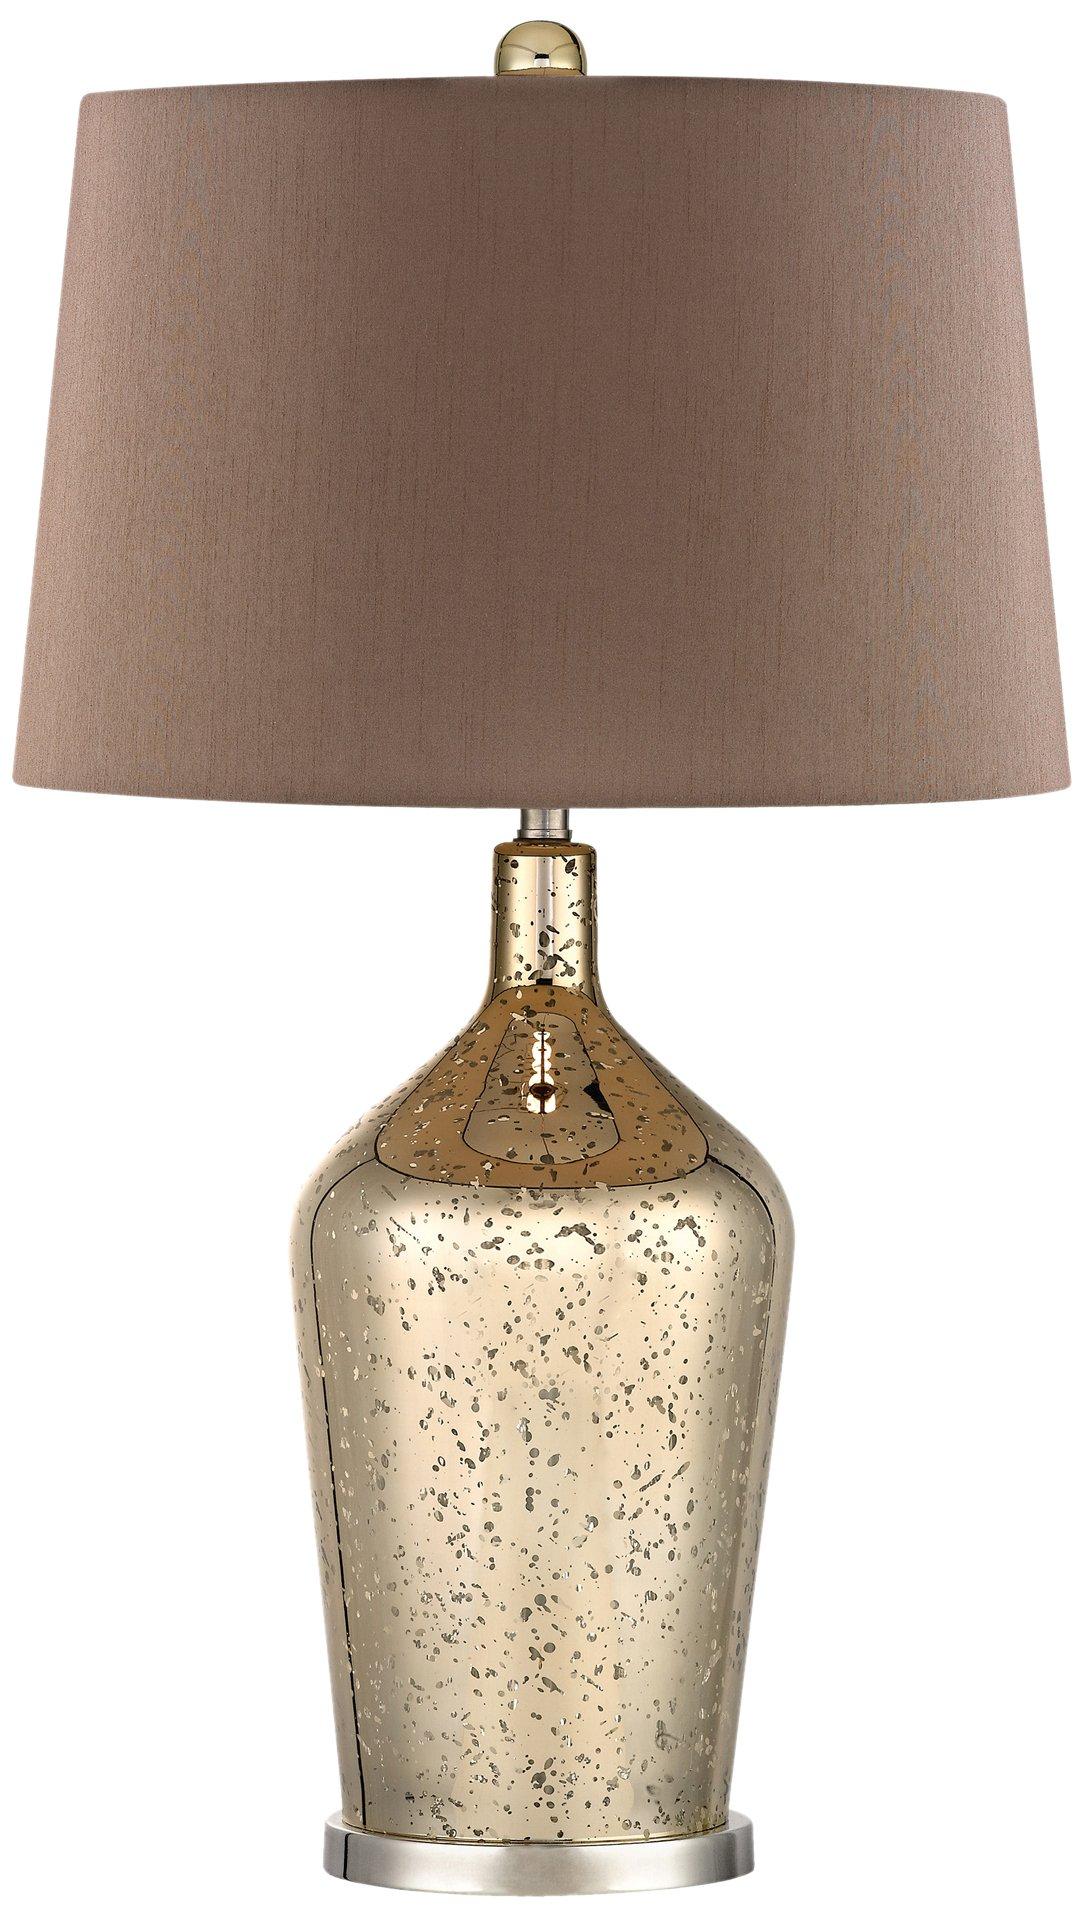 Dimond Lighting Antique Mercury Glass Bottle Lamp, Gold Antique